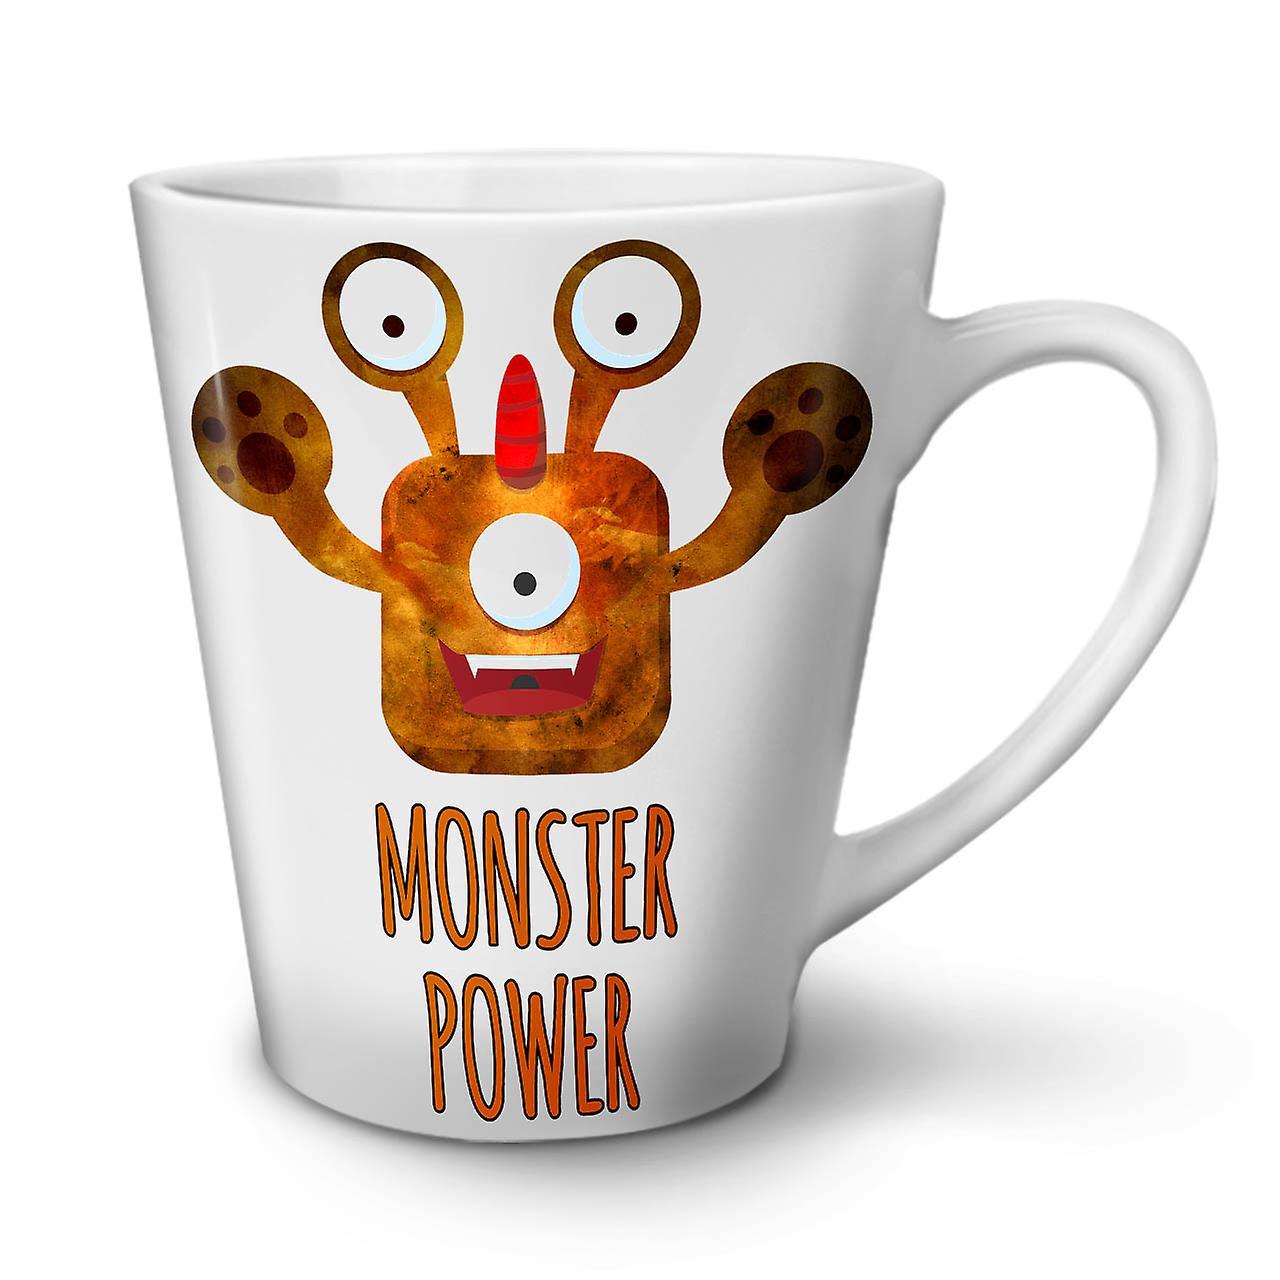 OzWellcoda Céramique Latte Blanc Nouveau Thé Power Café En Monster 12 Mug mNn0vy8wO